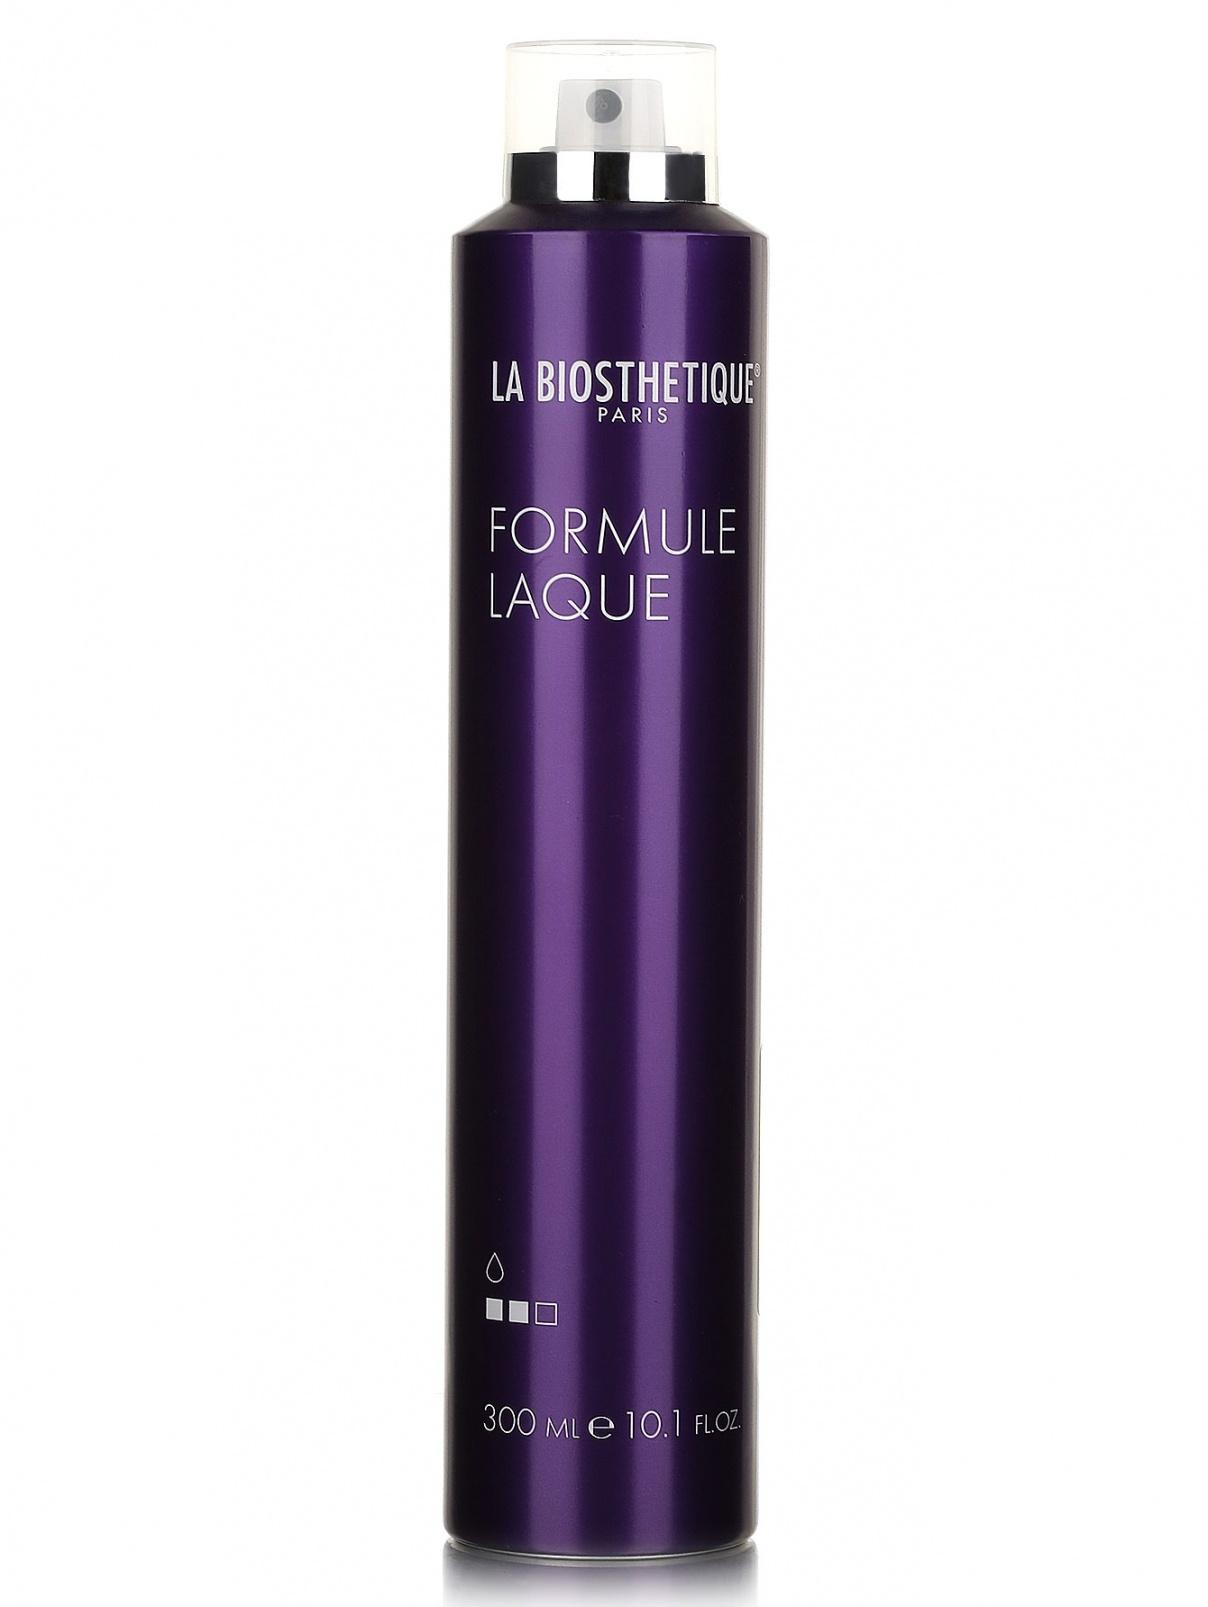 Лак Formule Laque - Hair Care, 300ml La Biosthetique  –  Общий вид